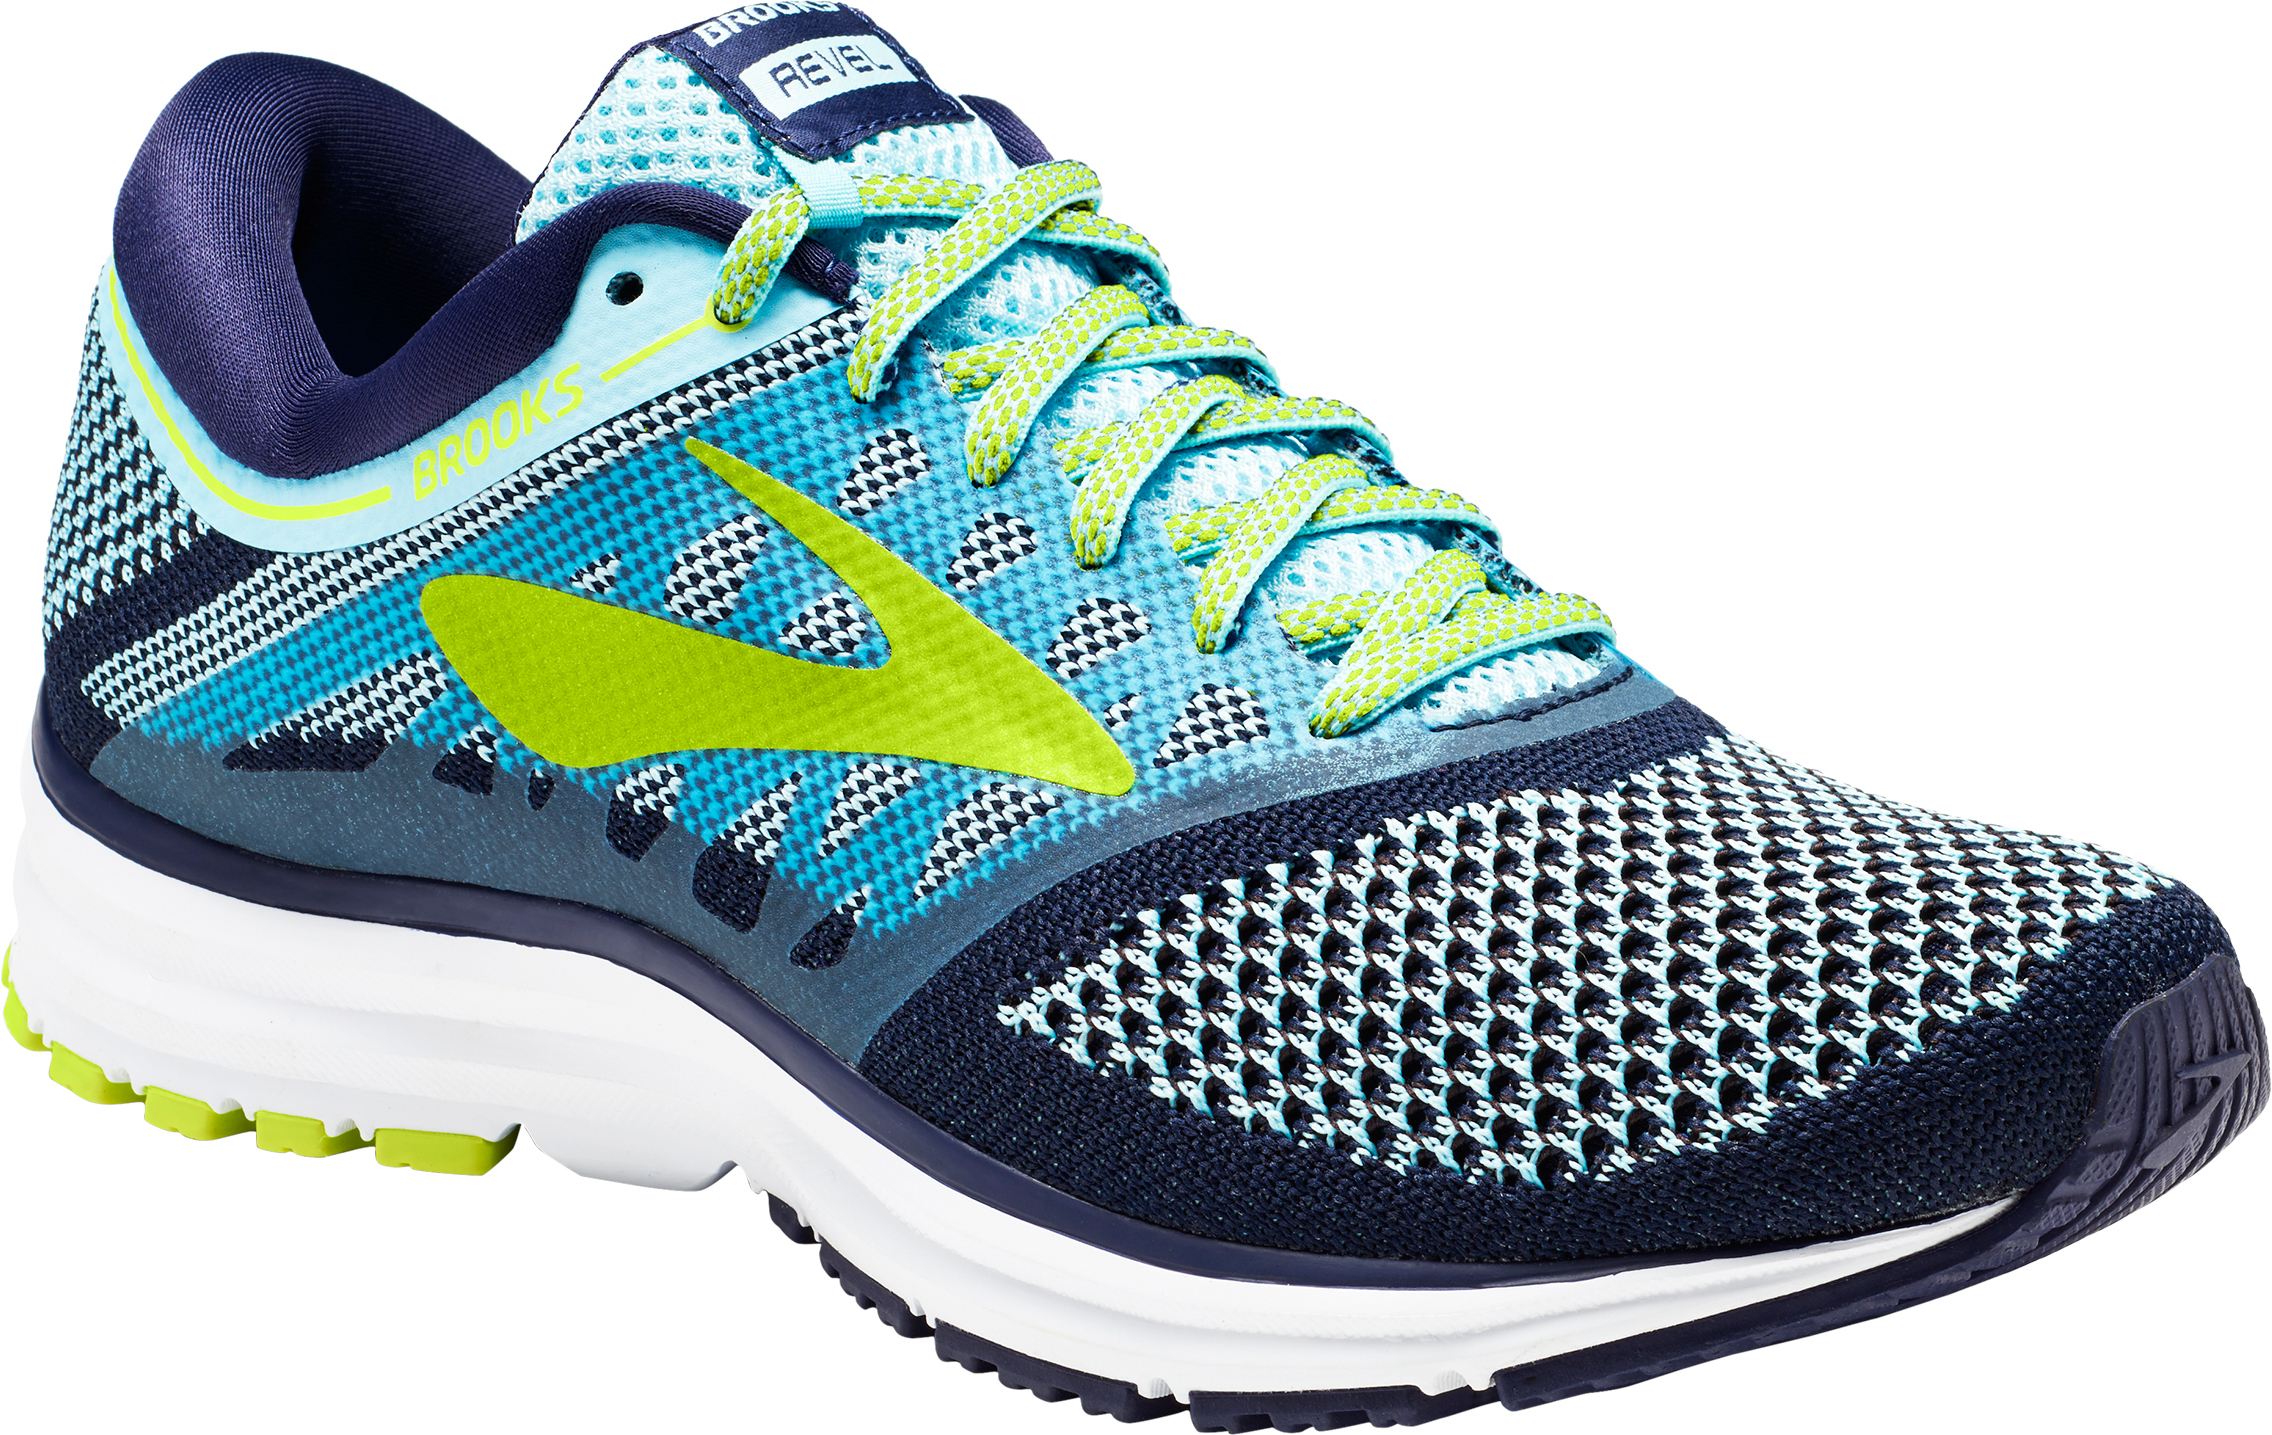 9af25c4209f Brooks Revel Road Running Shoes - Women s